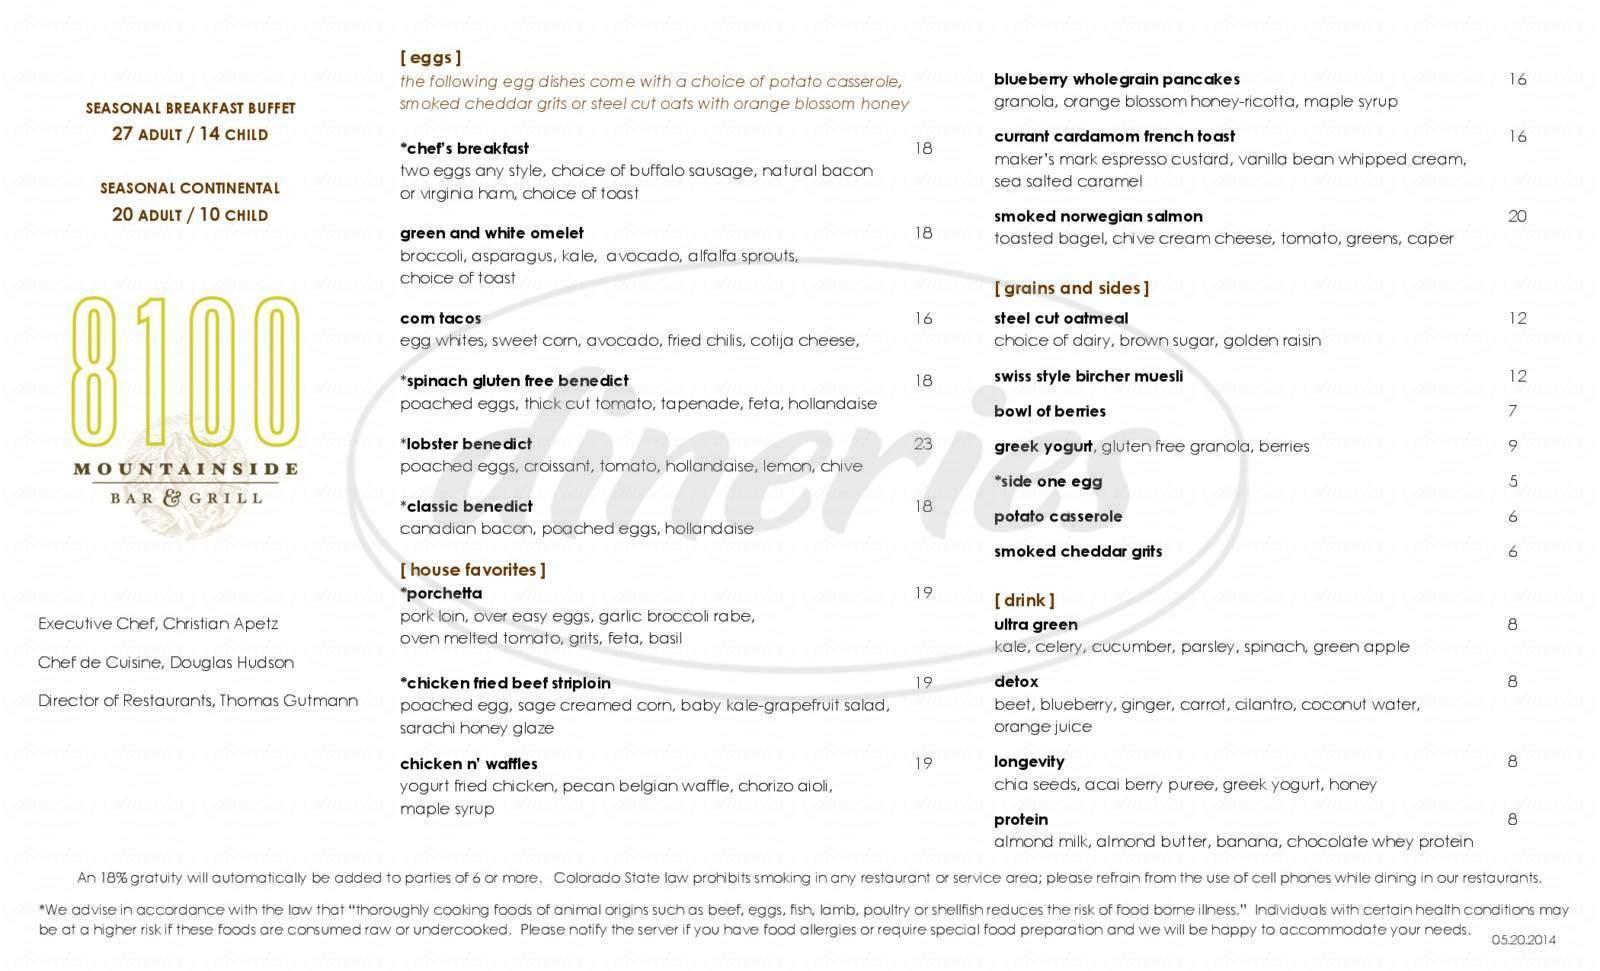 menu for 8100 Mountainside Bar & Grill